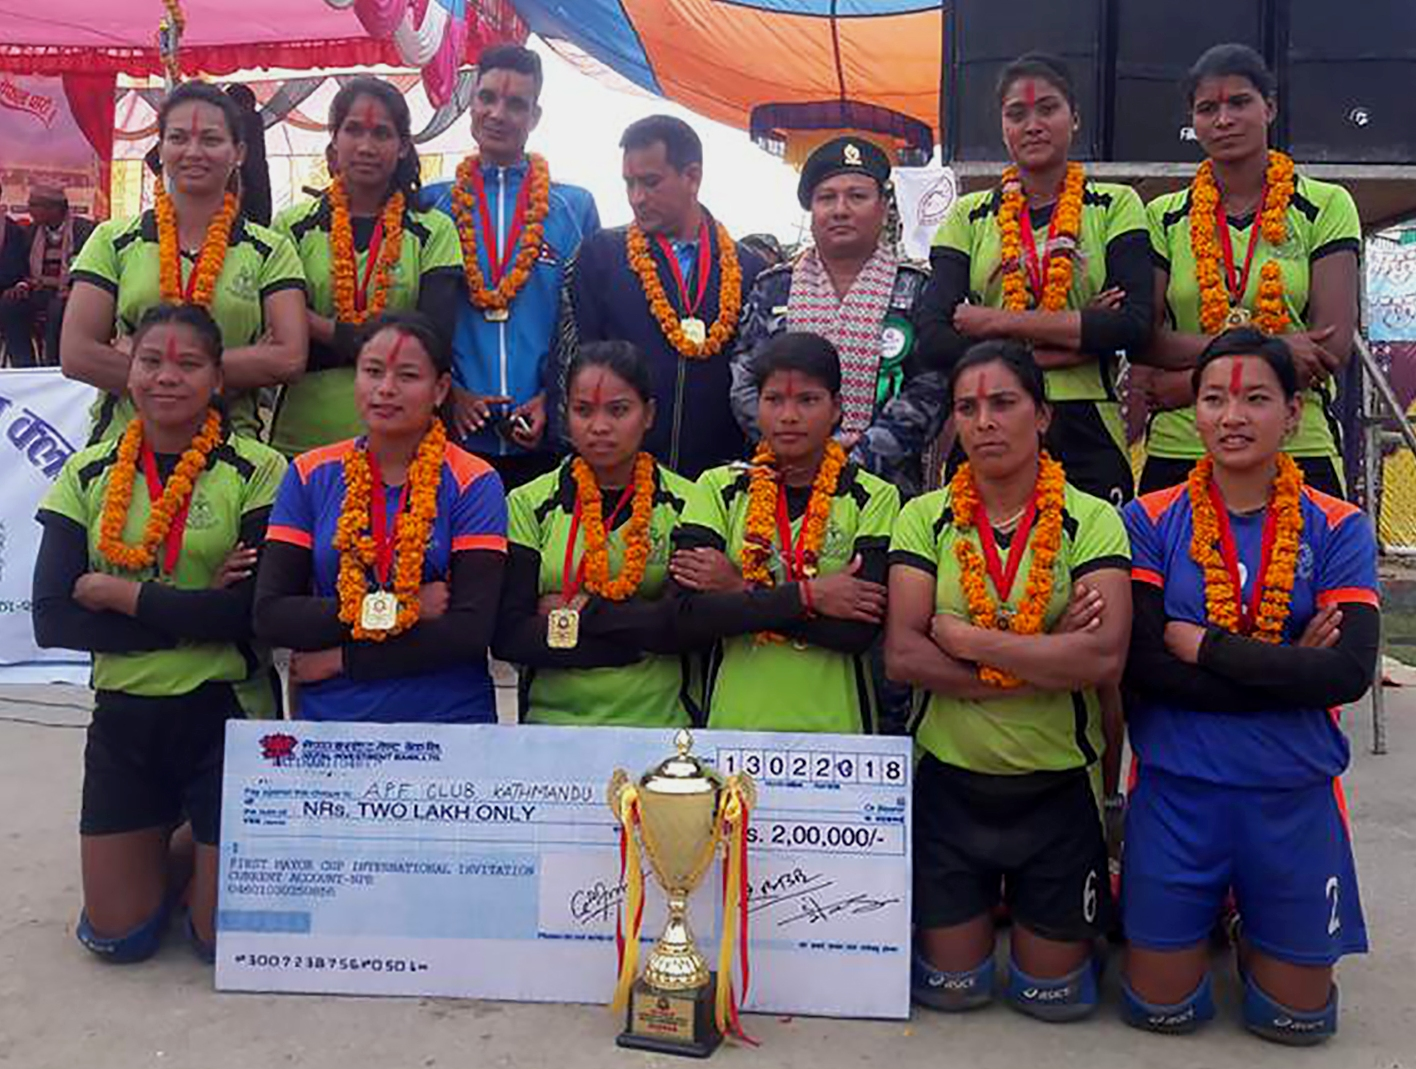 एपीएफलाई मेयर कप महिला भलिवलको उपाधि, एपीएफकी सरस्वती उत्कृष्ट खेलाडी